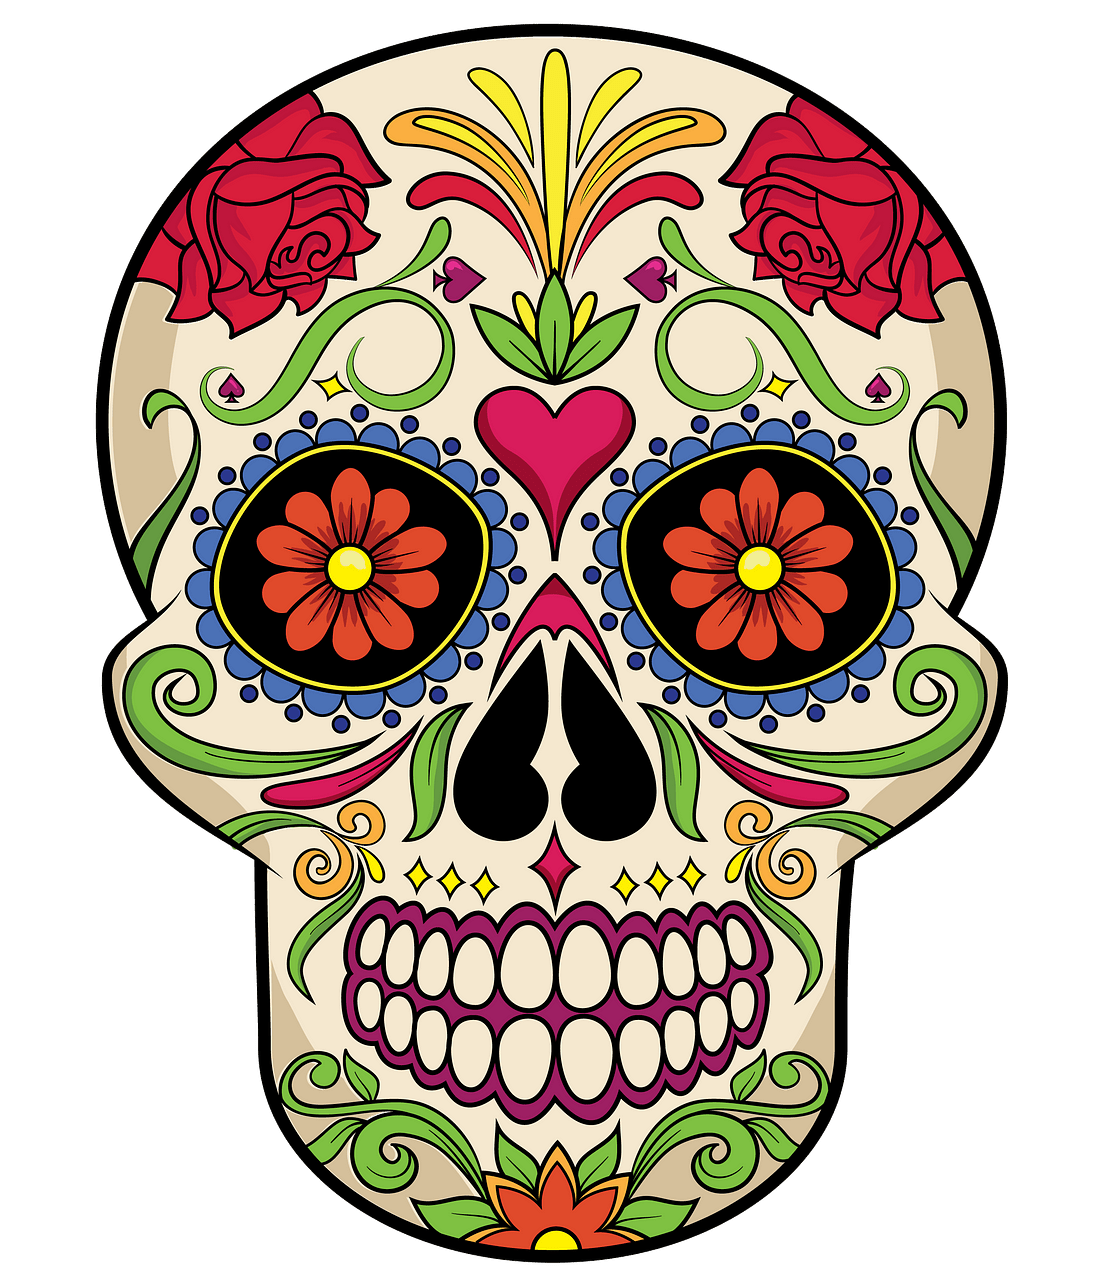 Sugar Skull clipart. Free download..